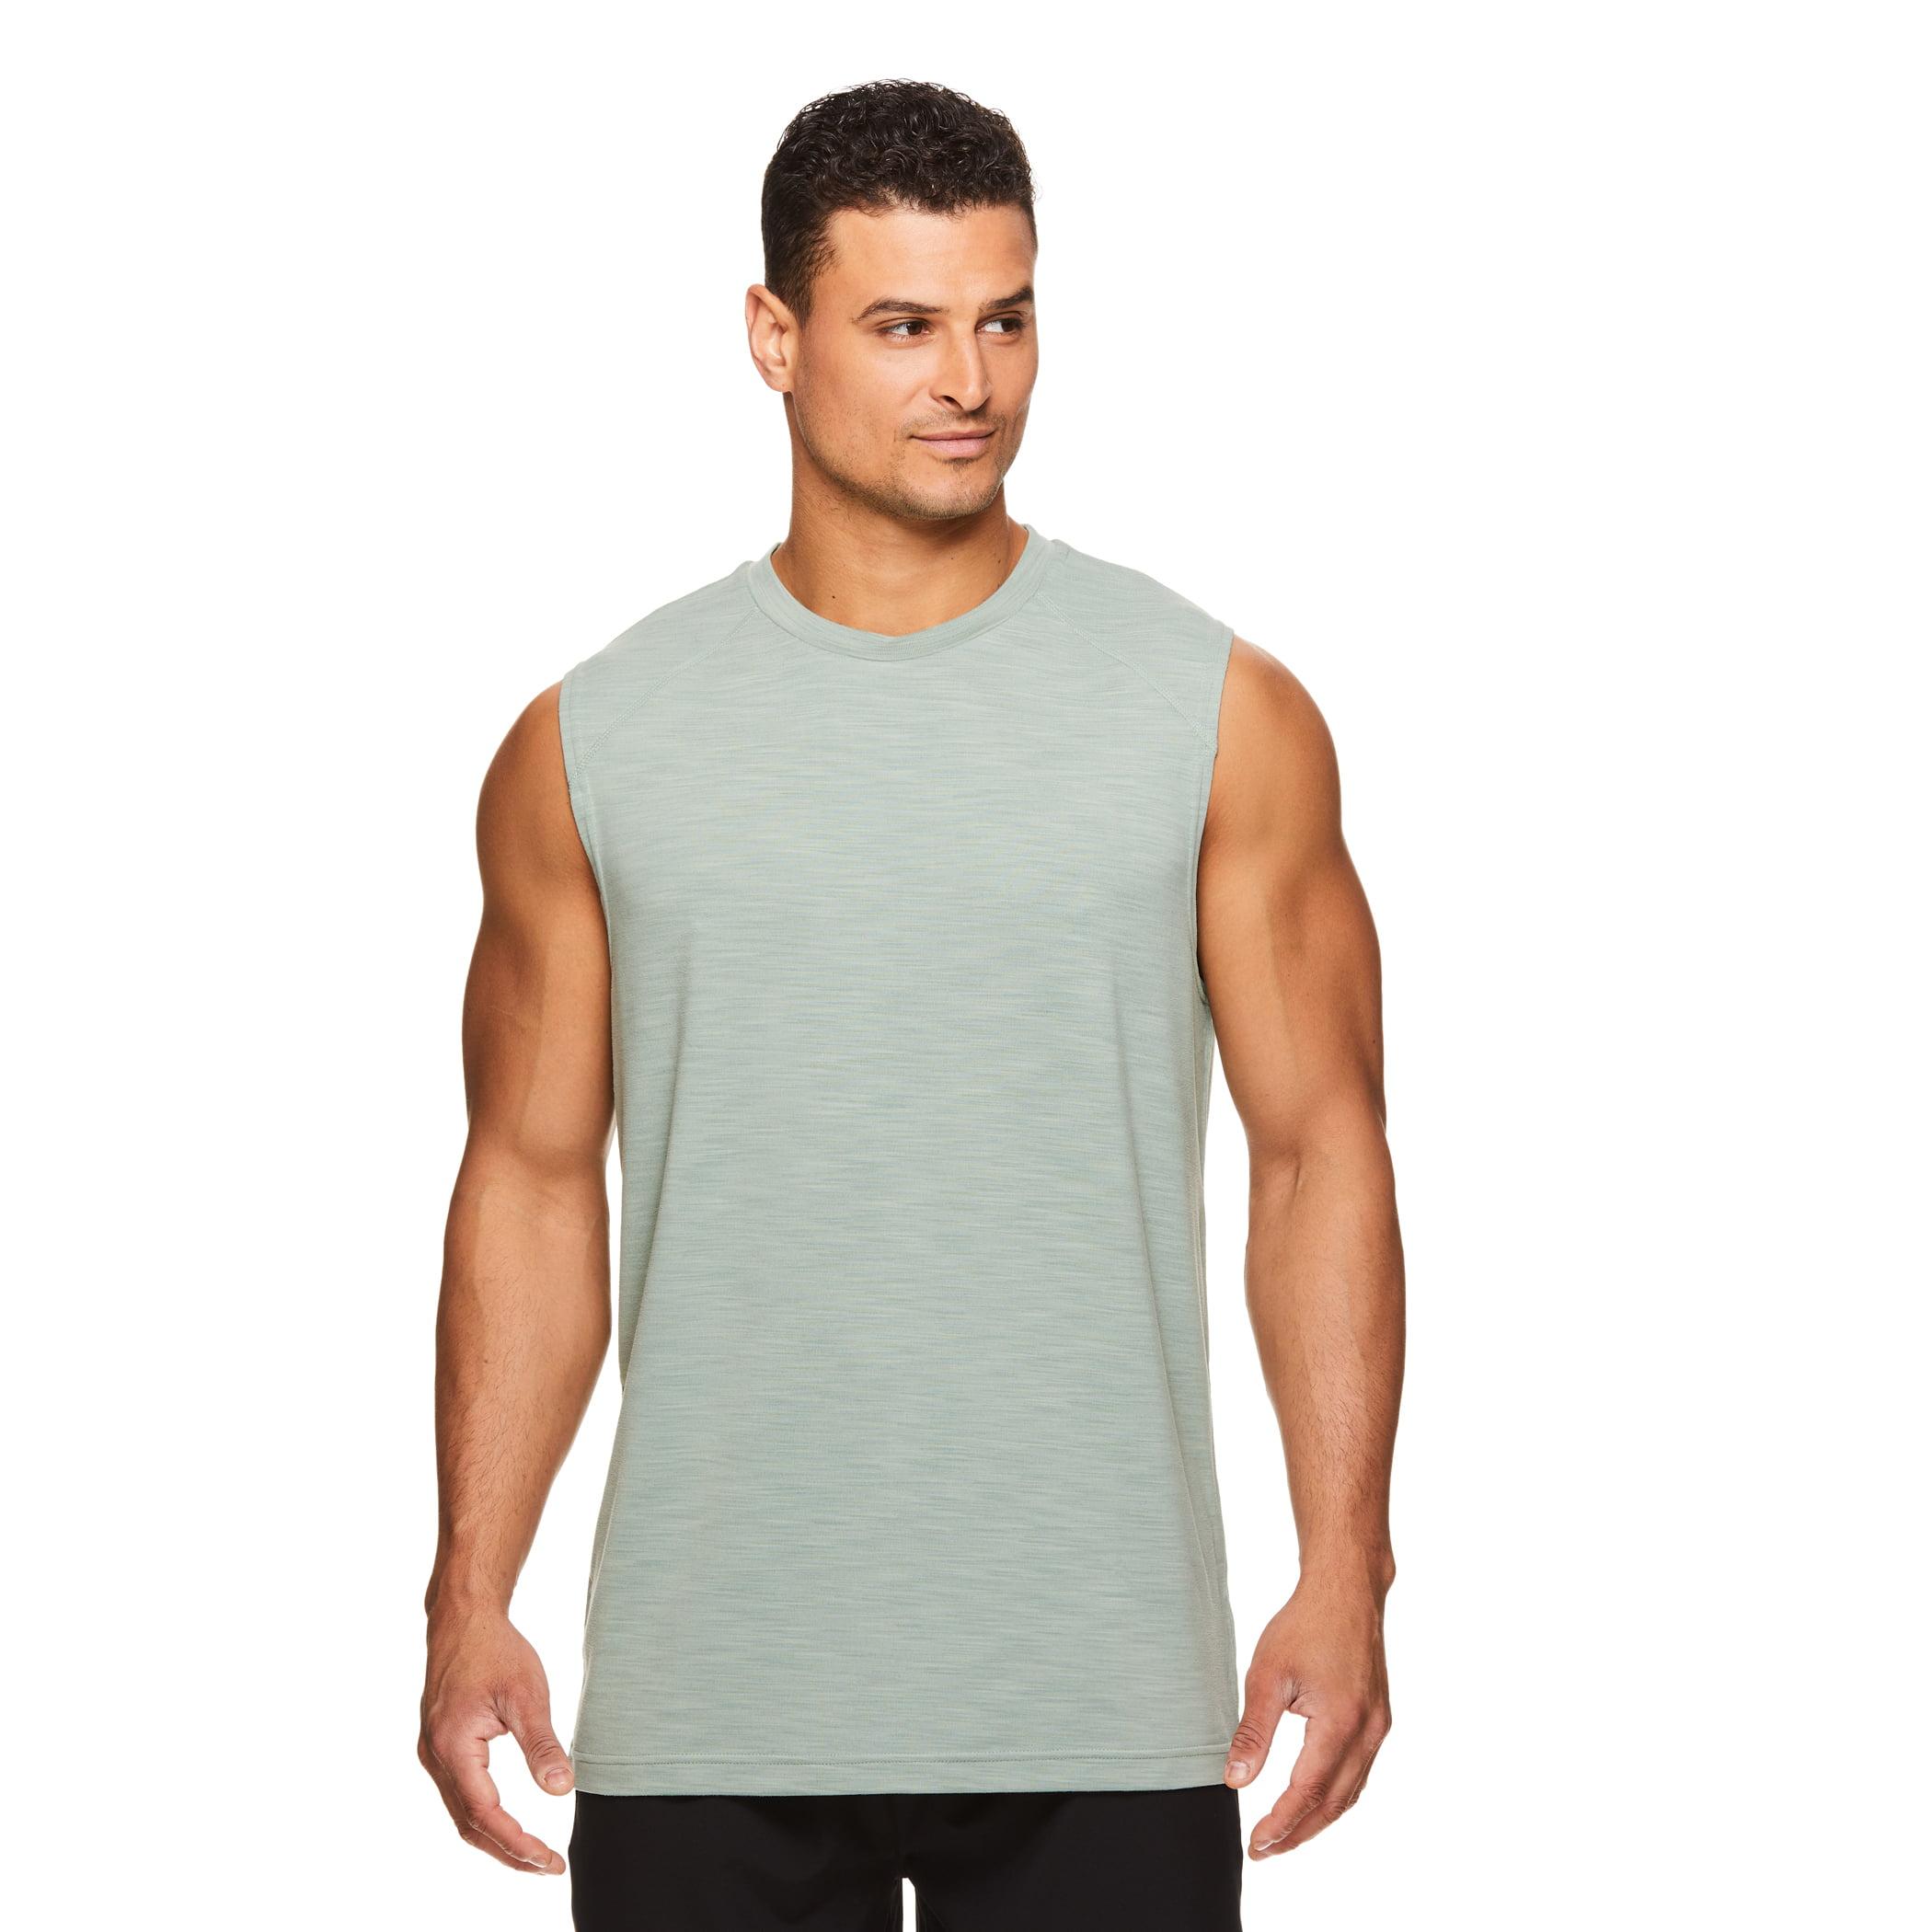 Gaiam Mens Everyday Basic Muscle Tank Top Sleeveless Yoga /& Workout Shirt